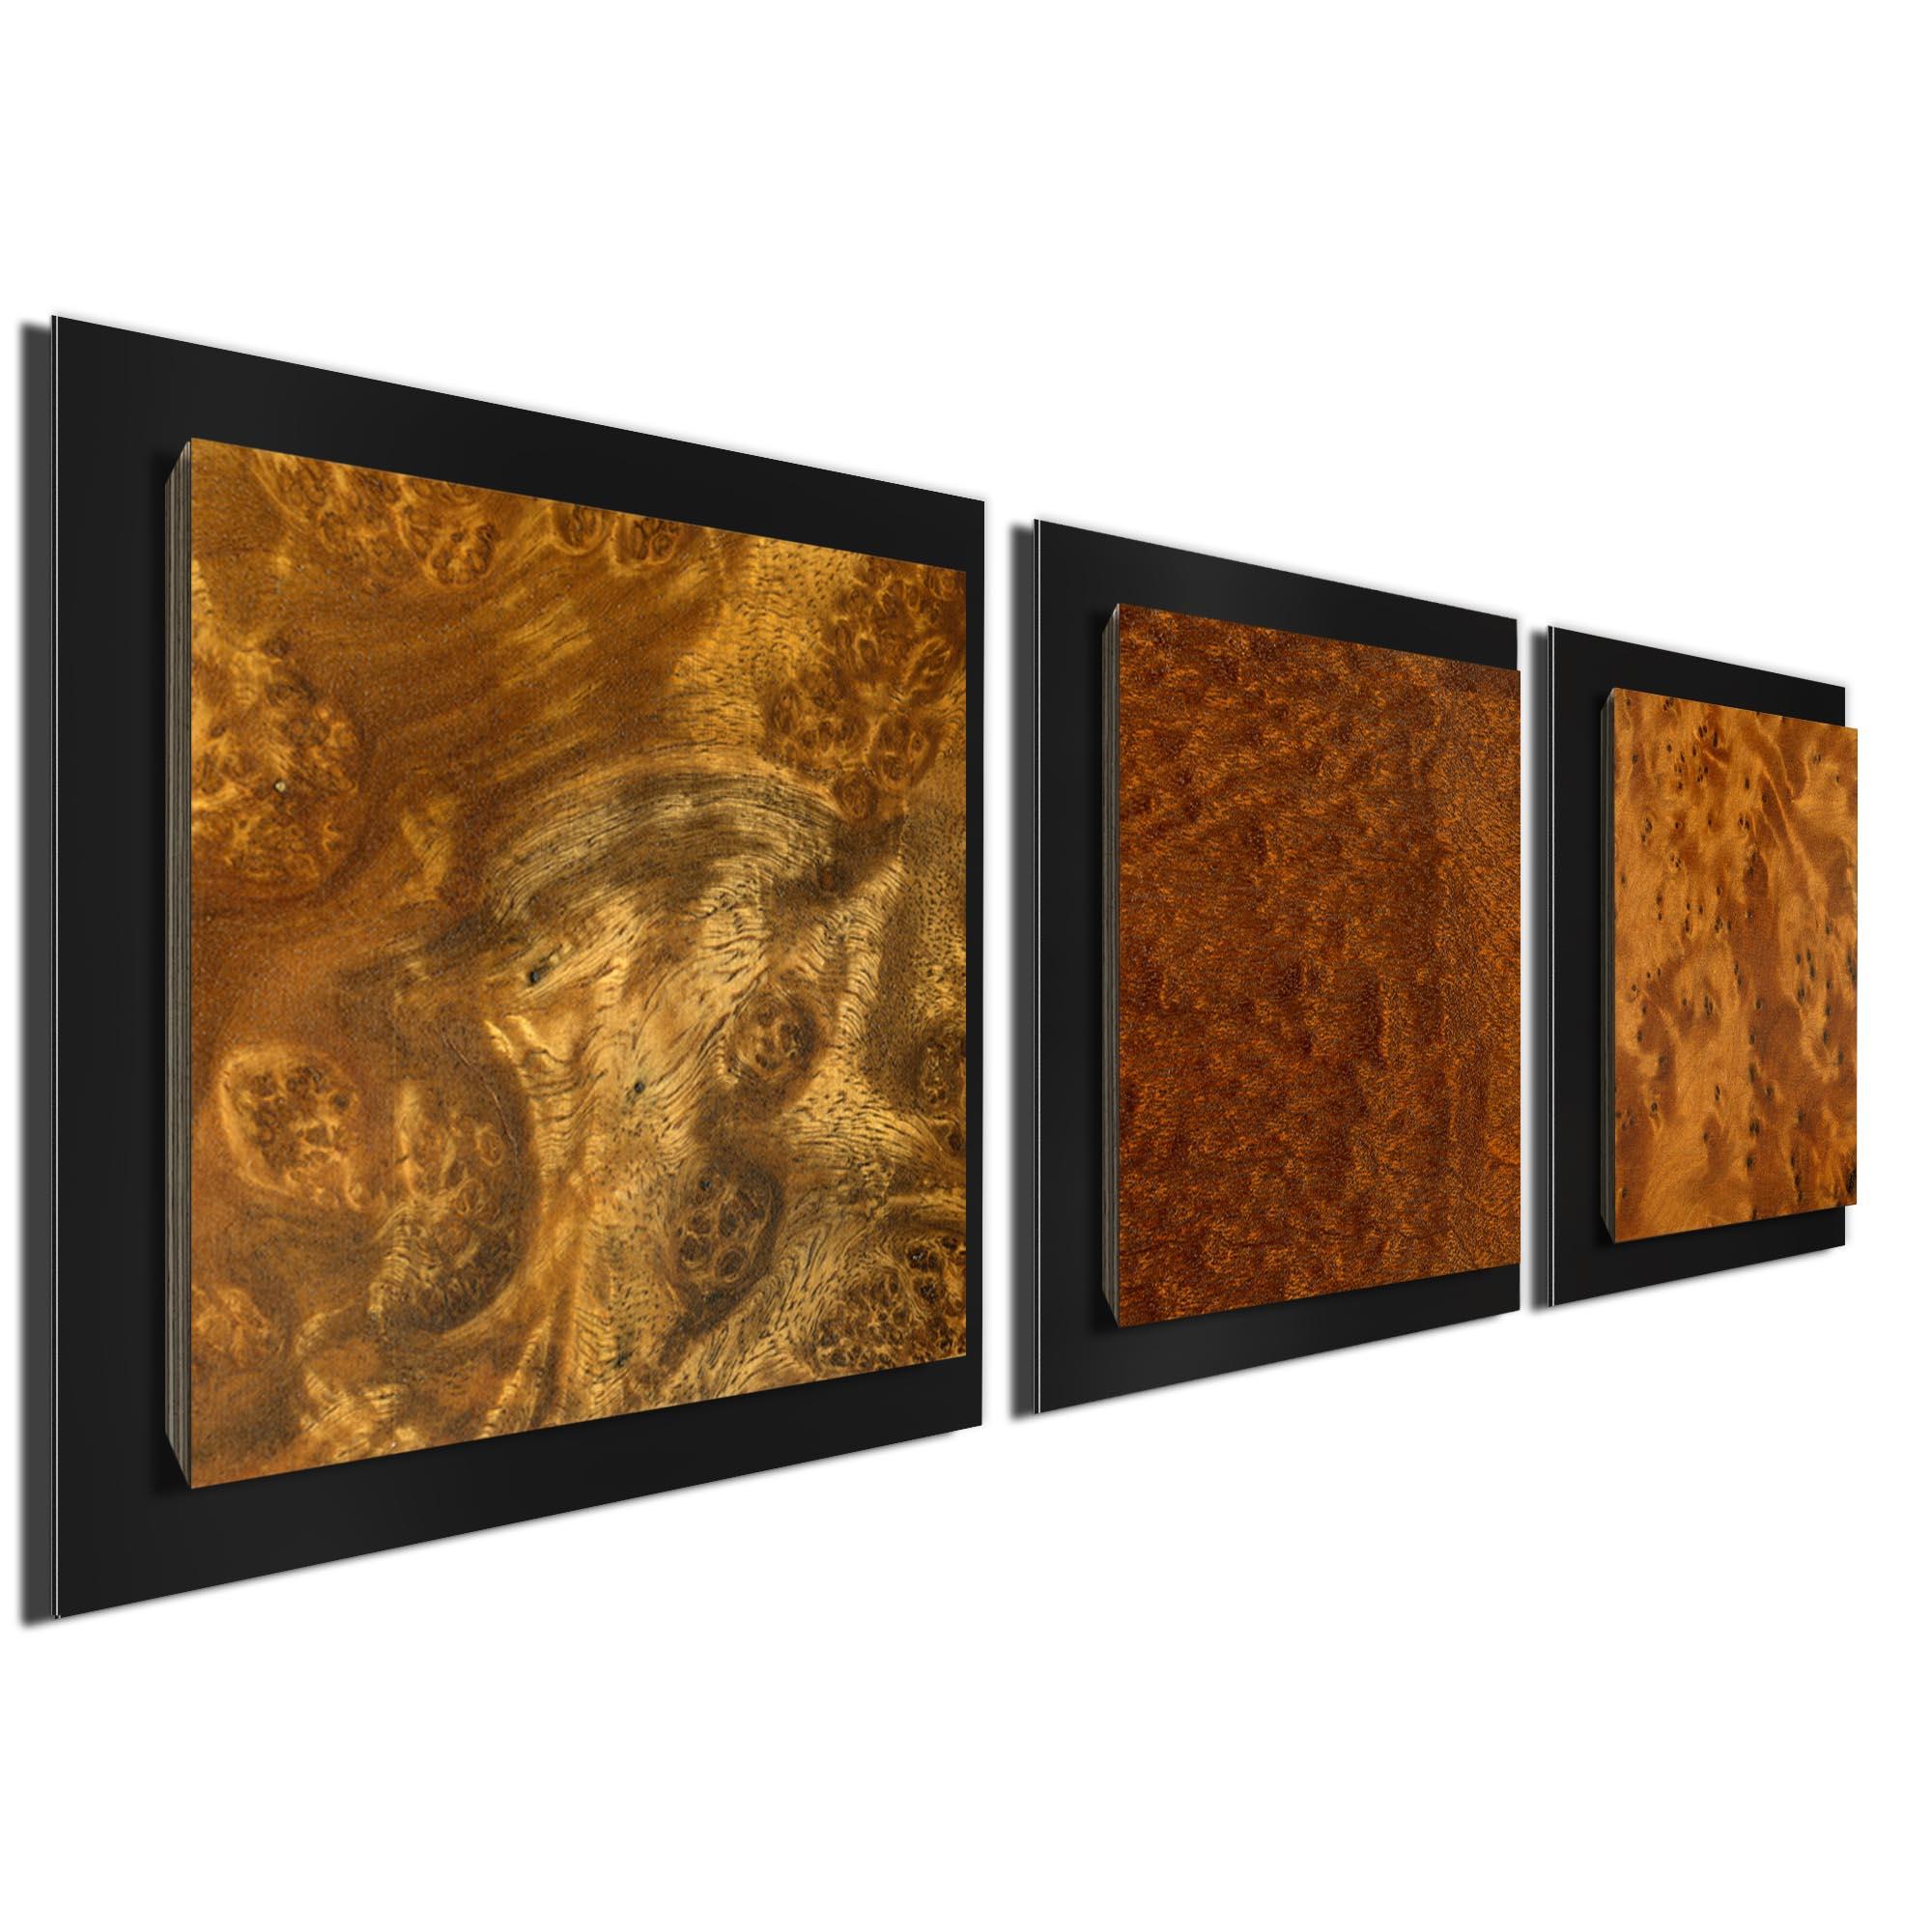 Dark Burl Essence Black by Jackson Wright Rustic Modern Style Wood Wall Art - Image 2